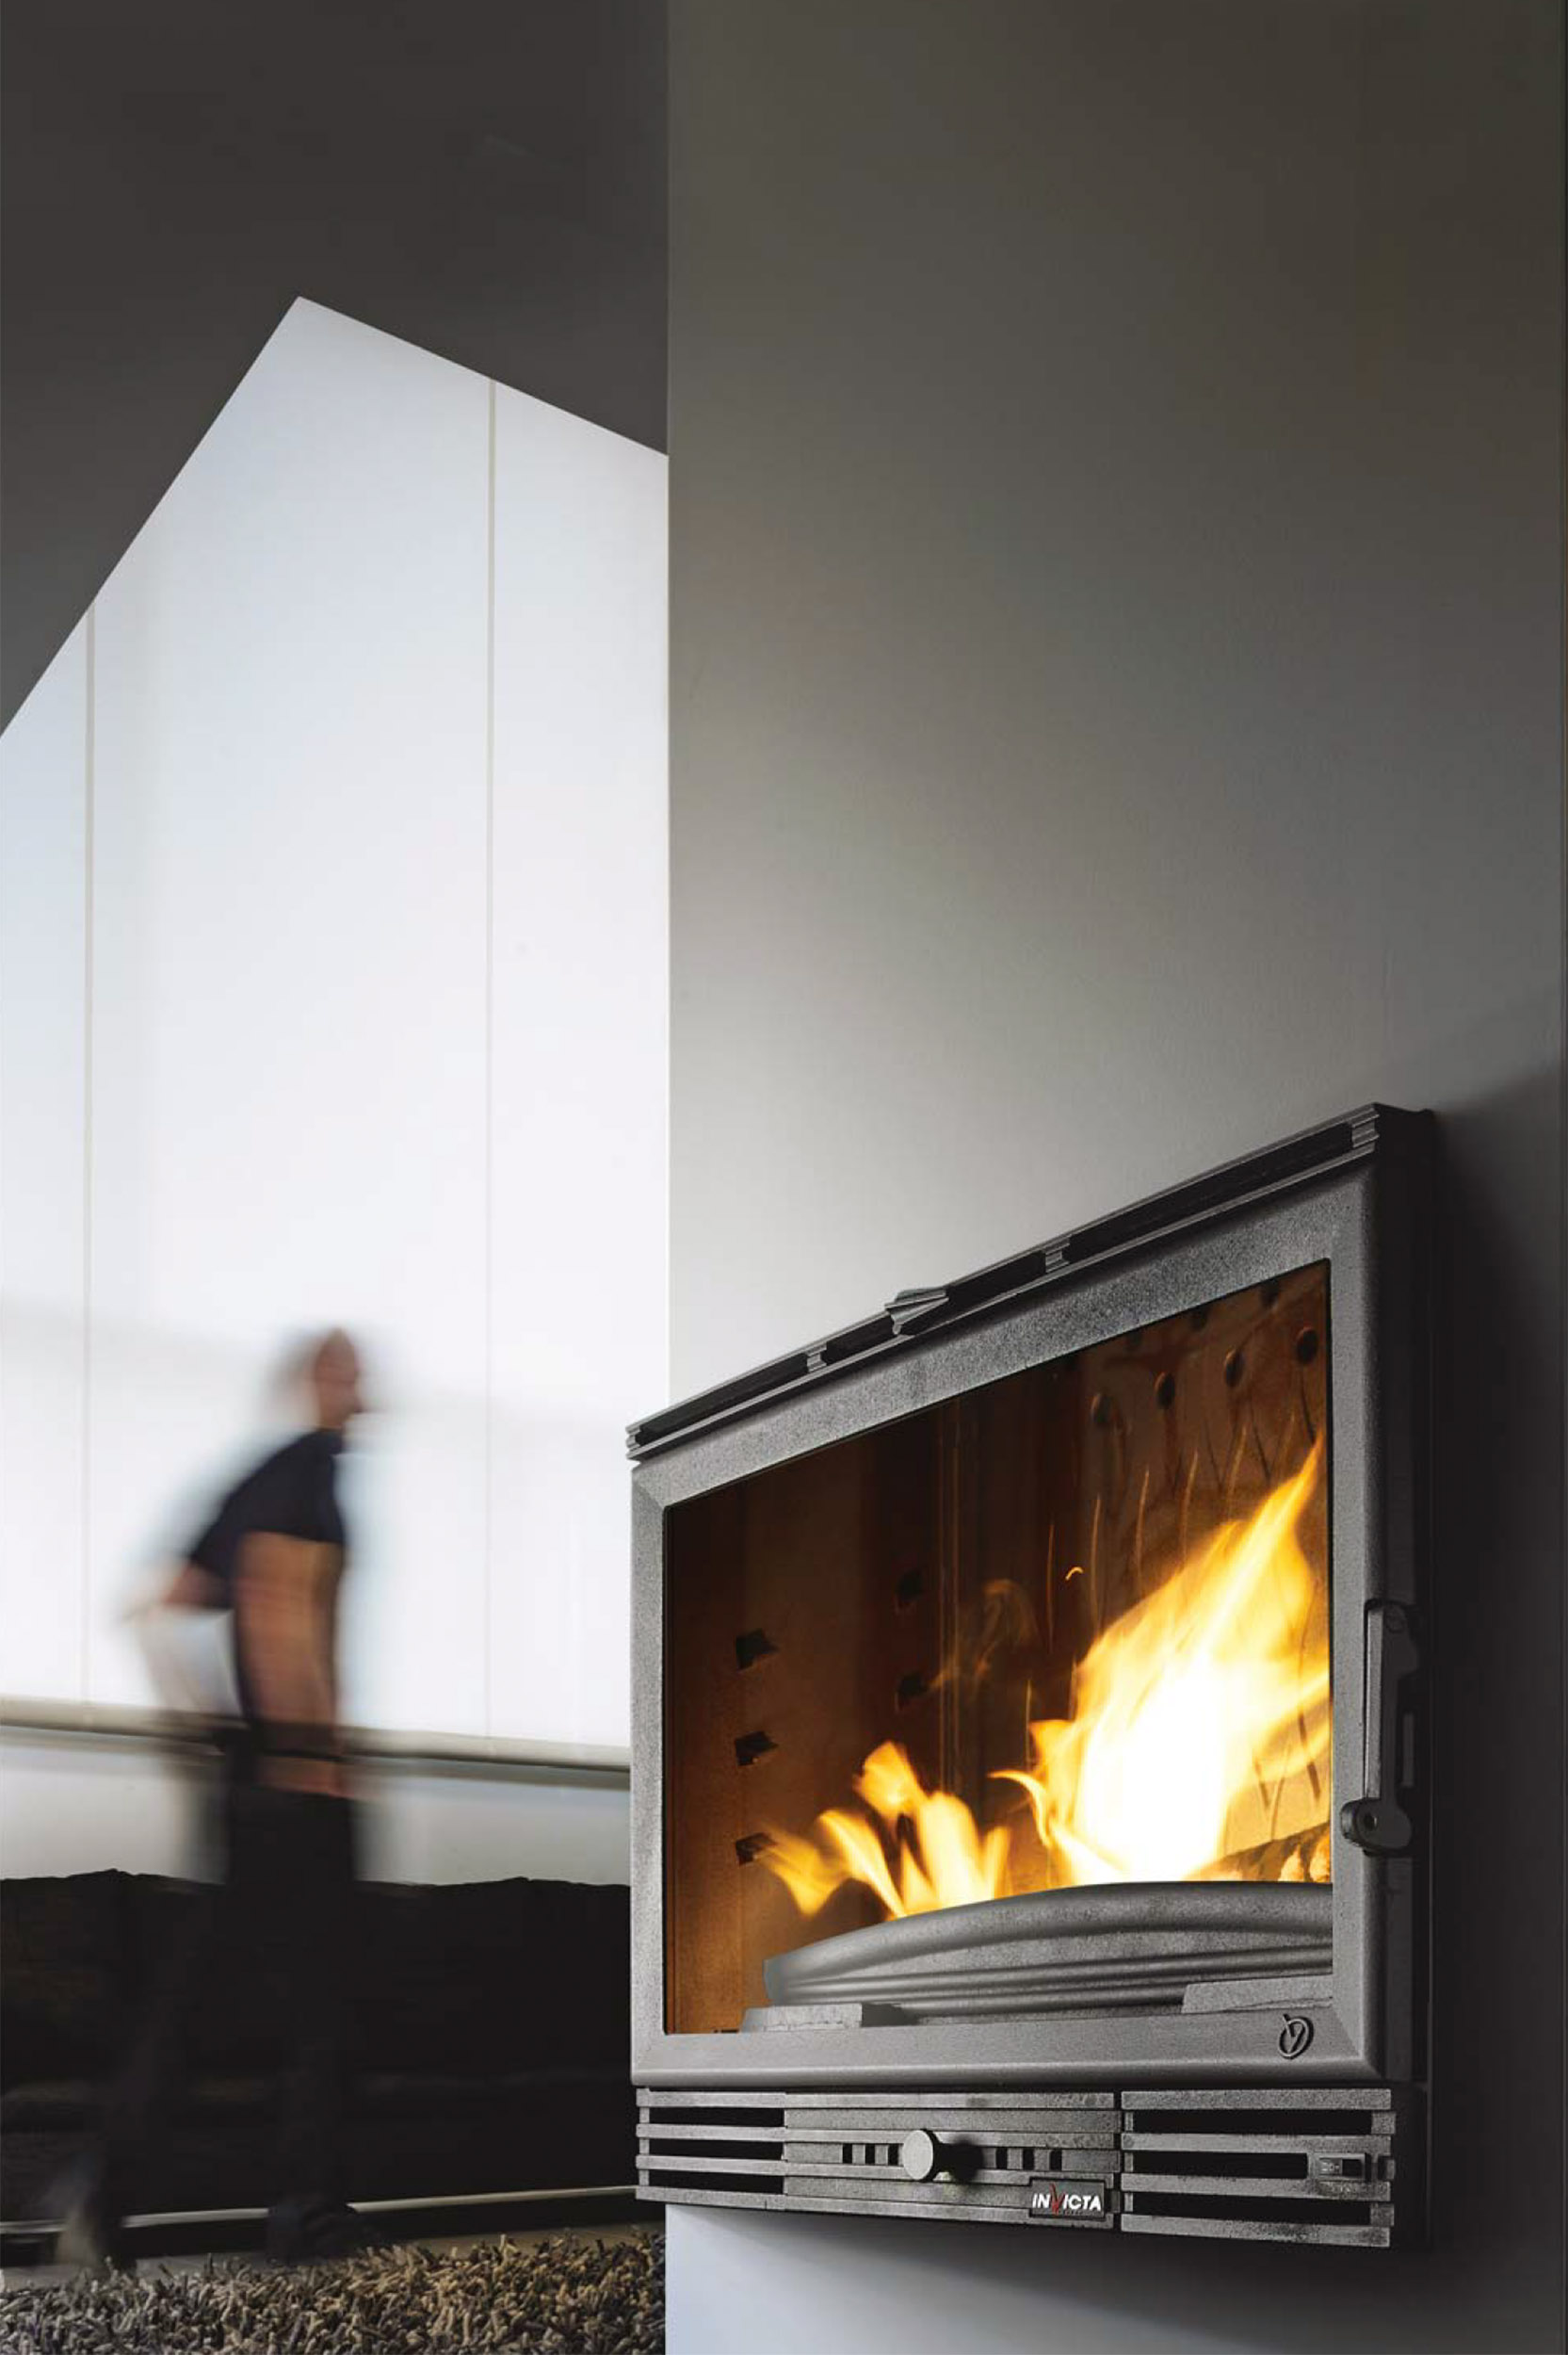 Moderna chimenea empotrada en la pared de una sala de vivienda